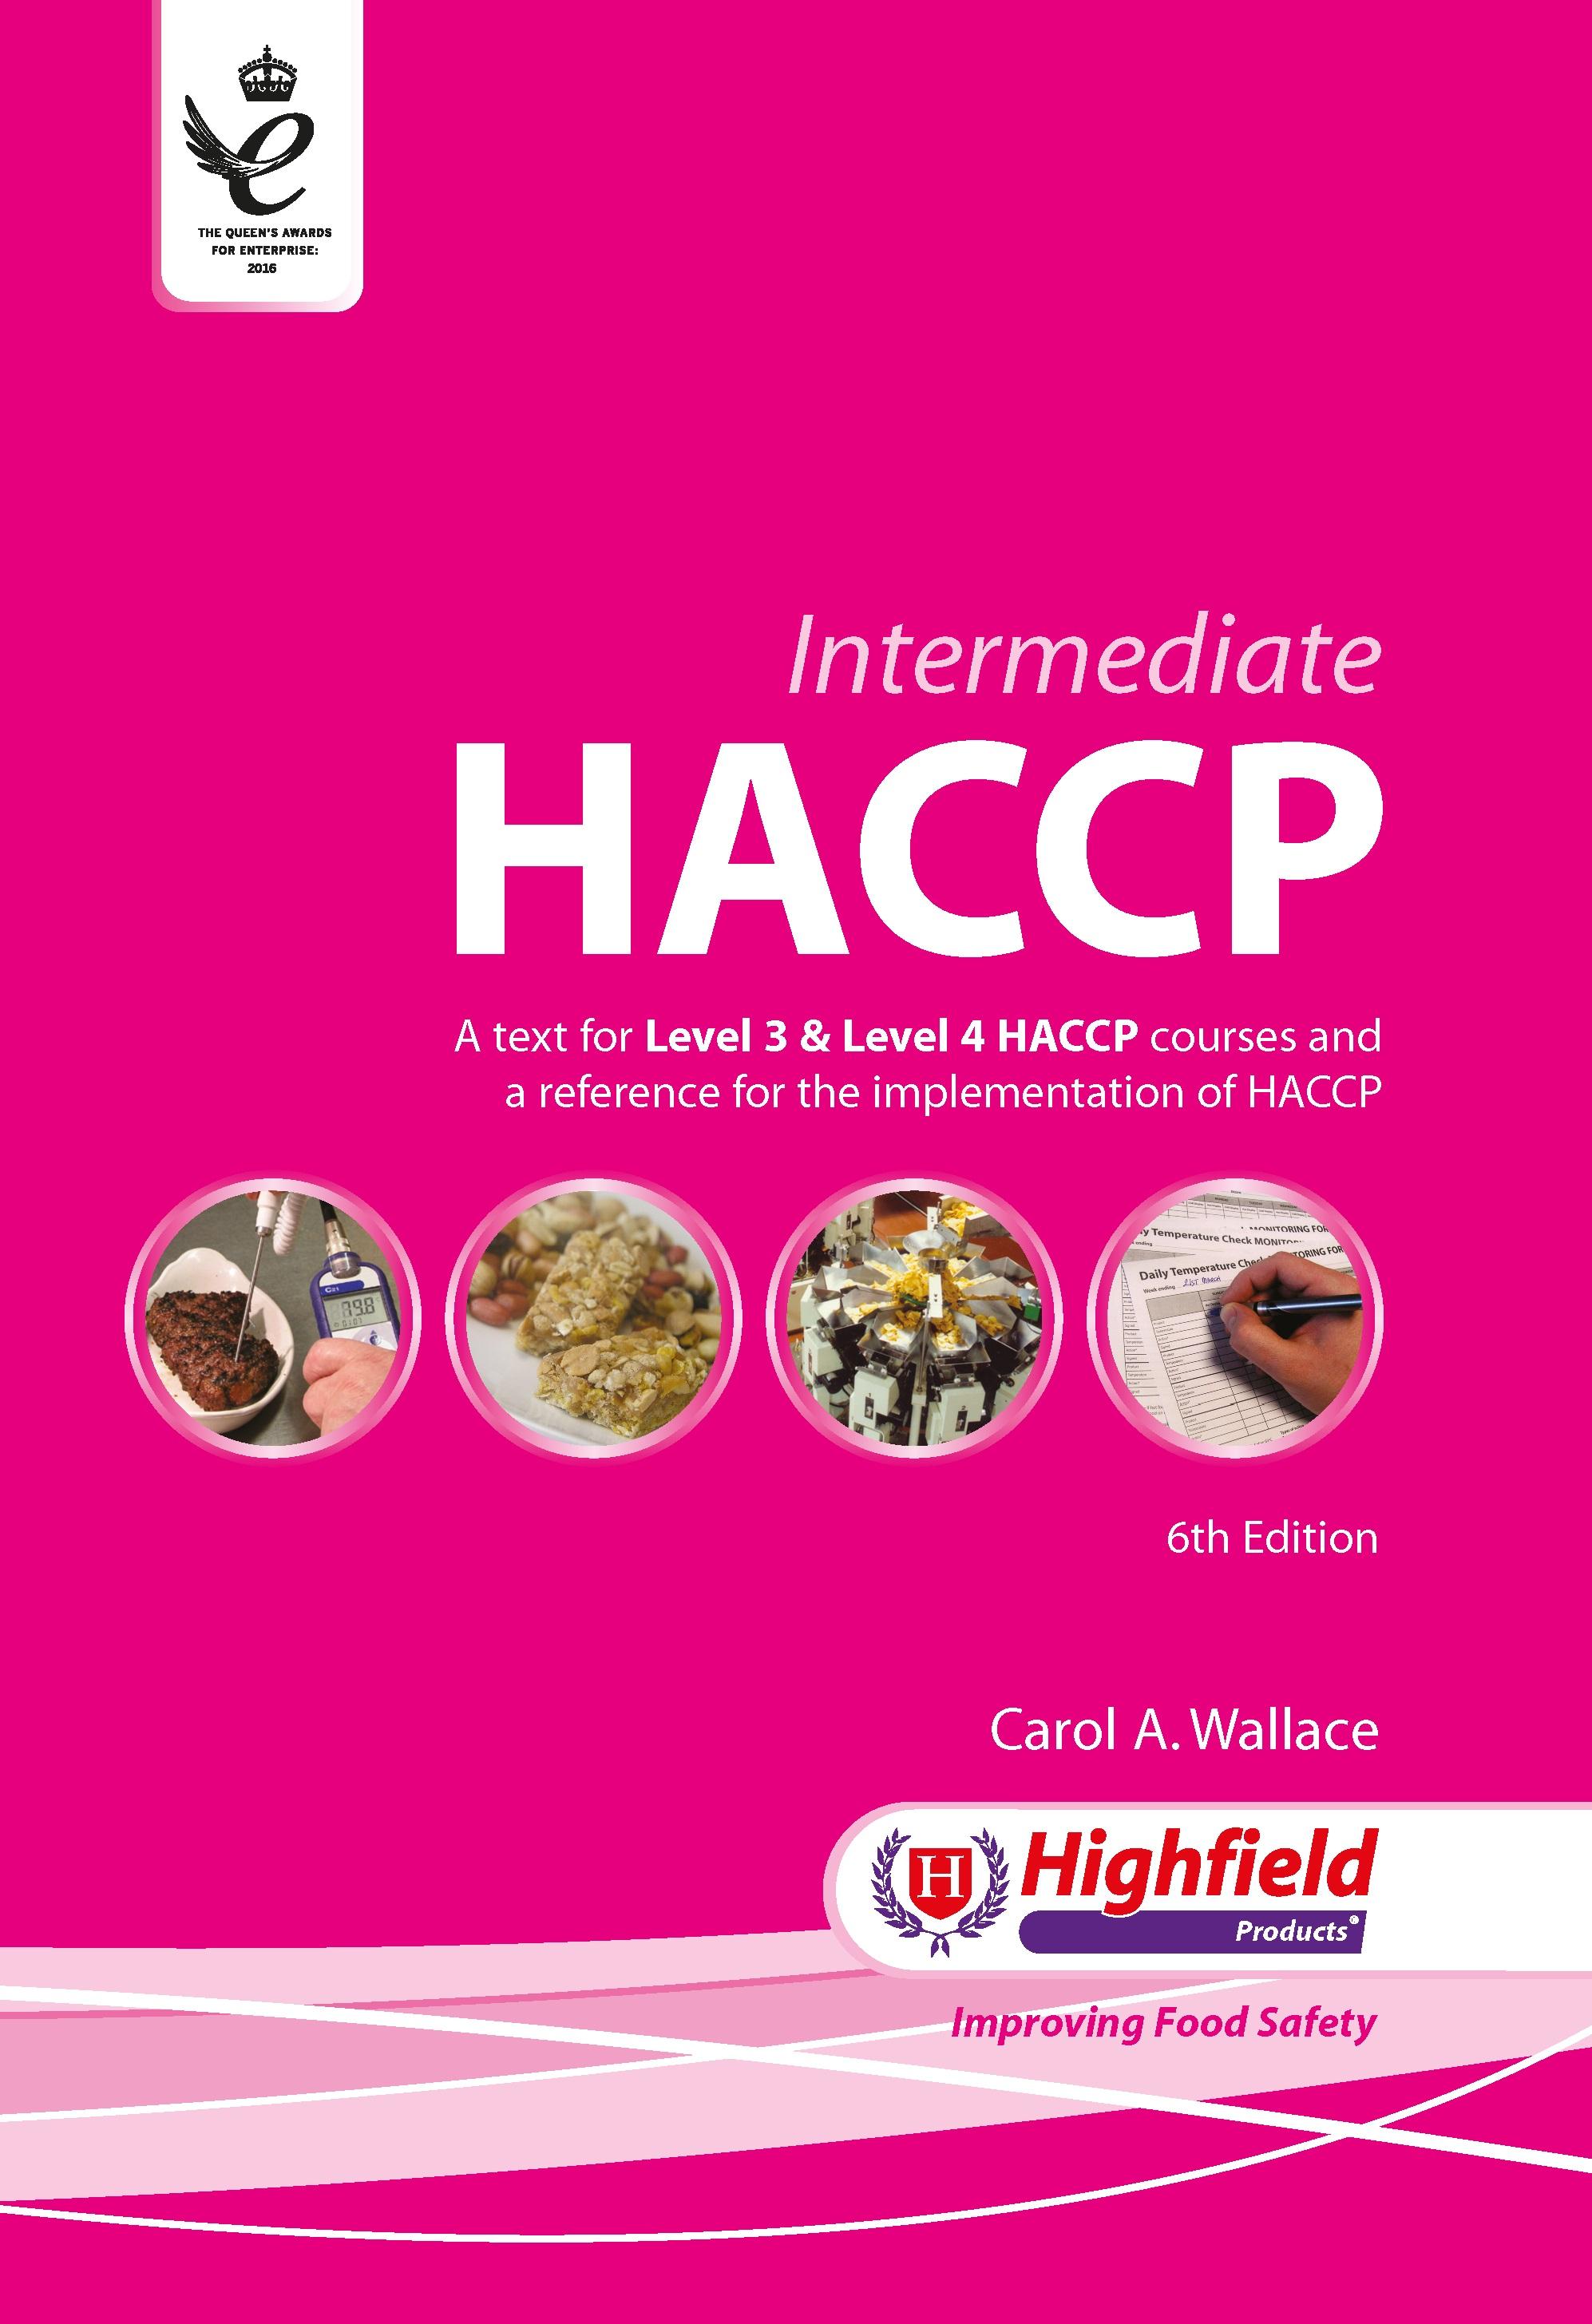 HACCP Level 3 Training – 2-days